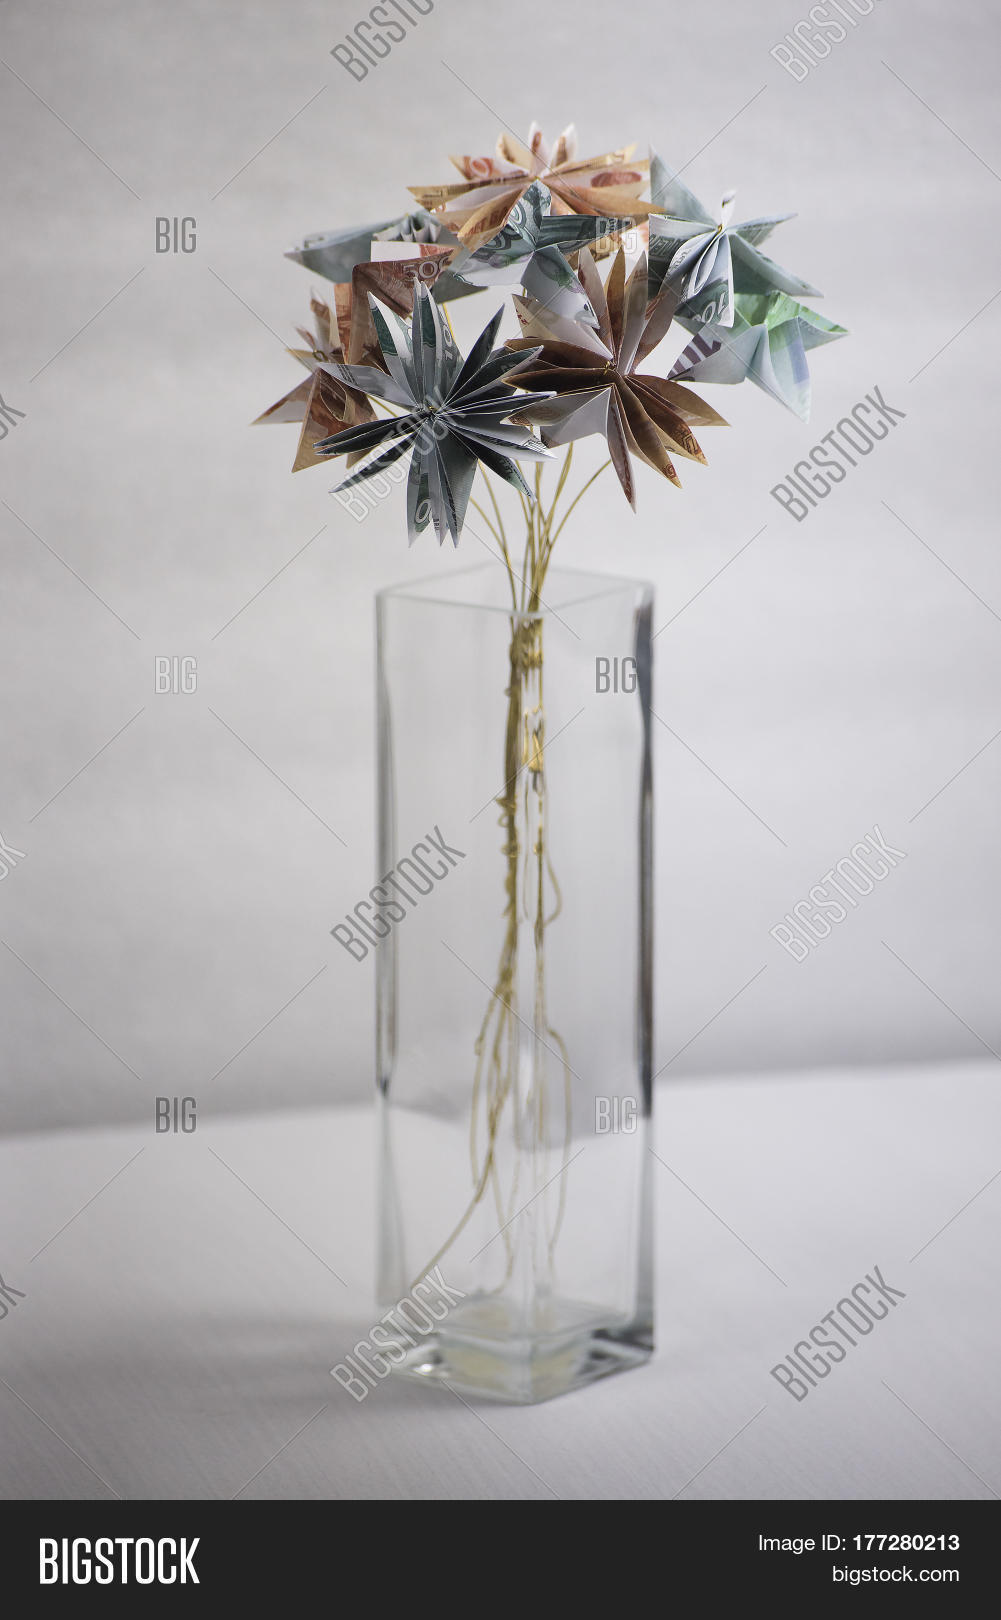 Bouquet Origami Image Photo Free Trial Bigstock